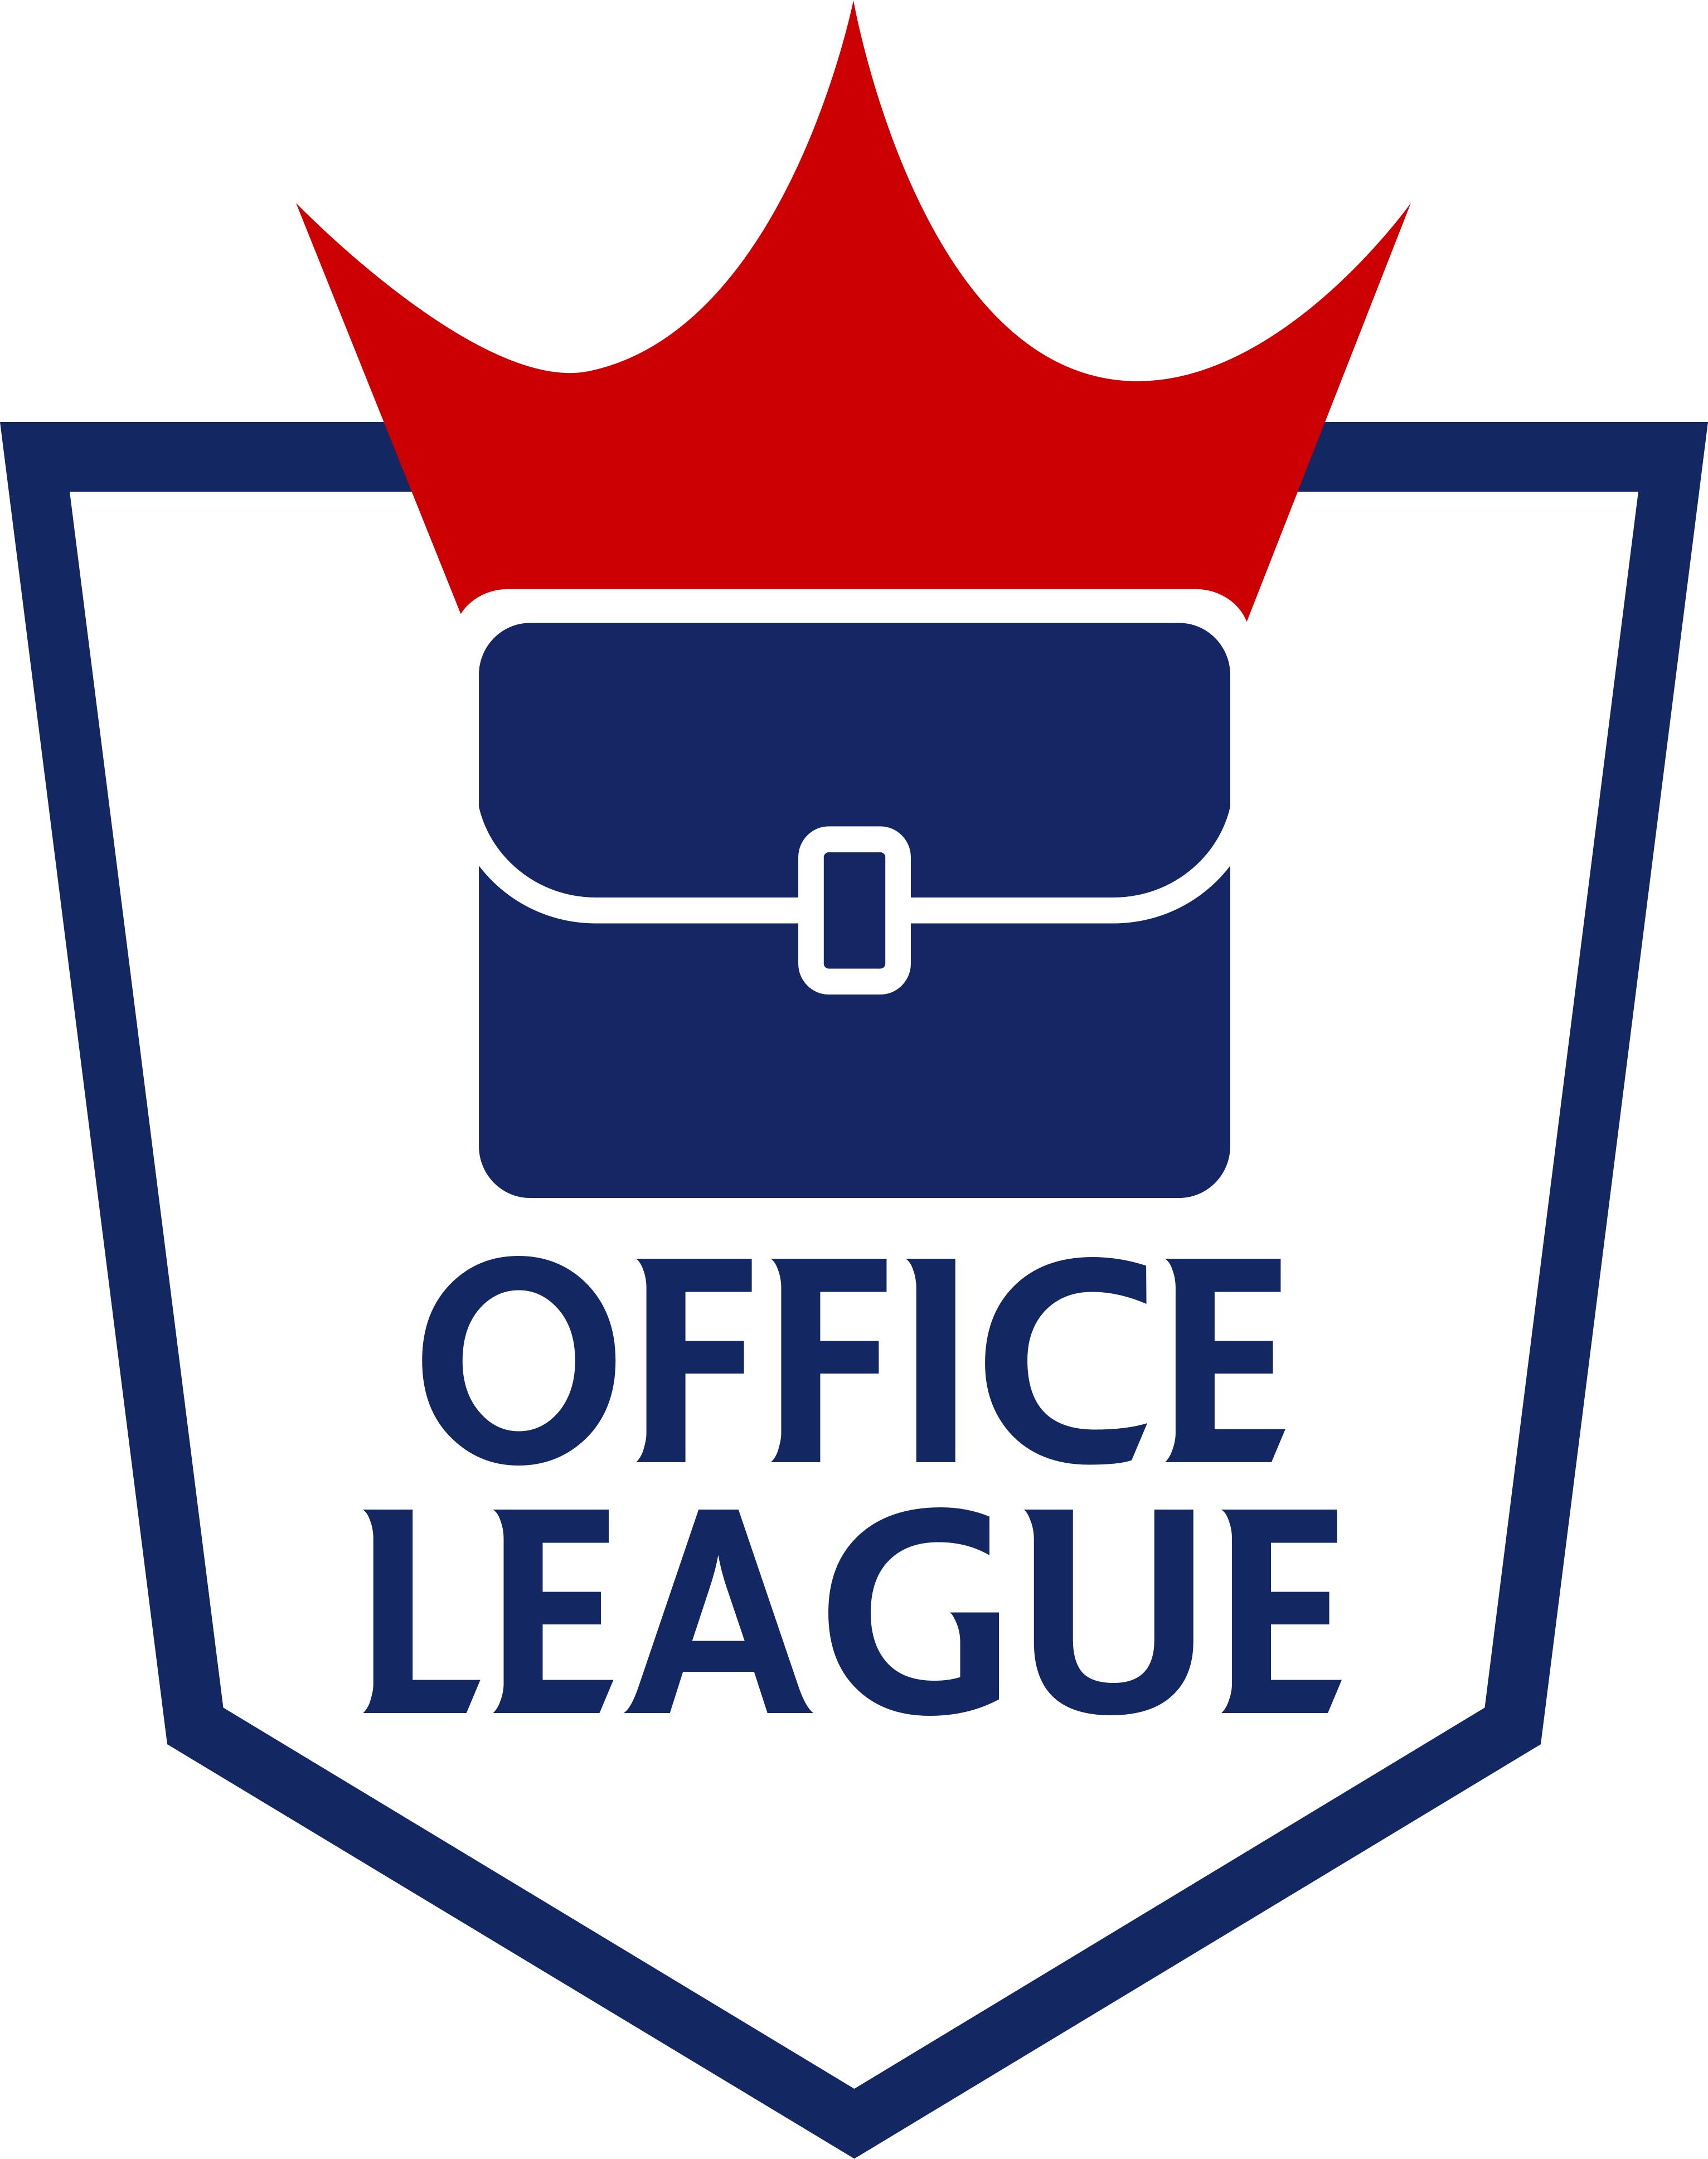 Office League